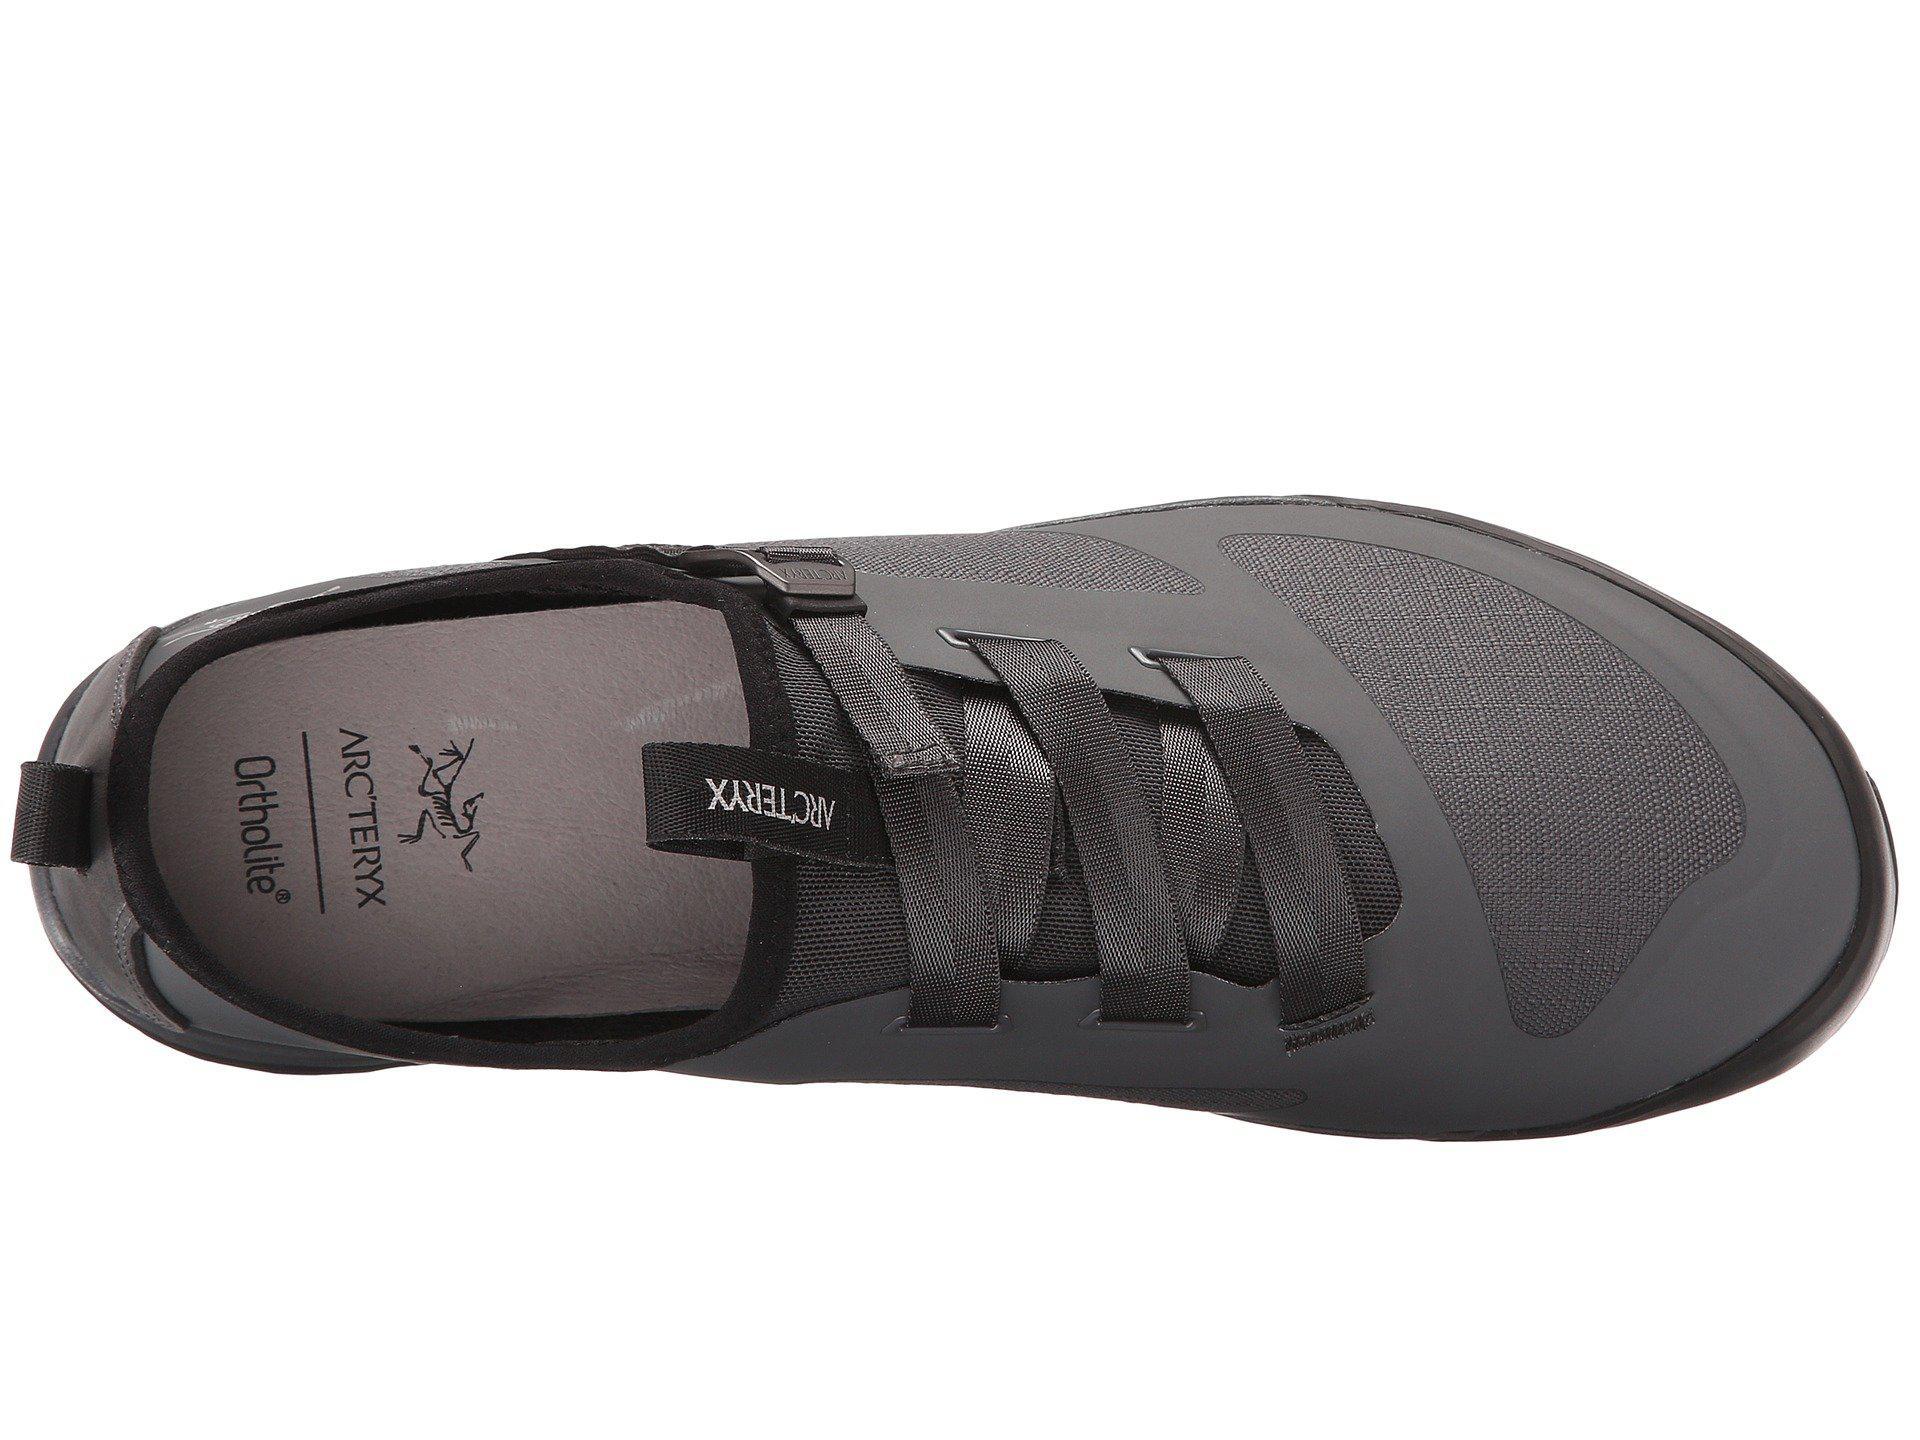 La sportiva boulder x approach shoe mens grey 420 dating